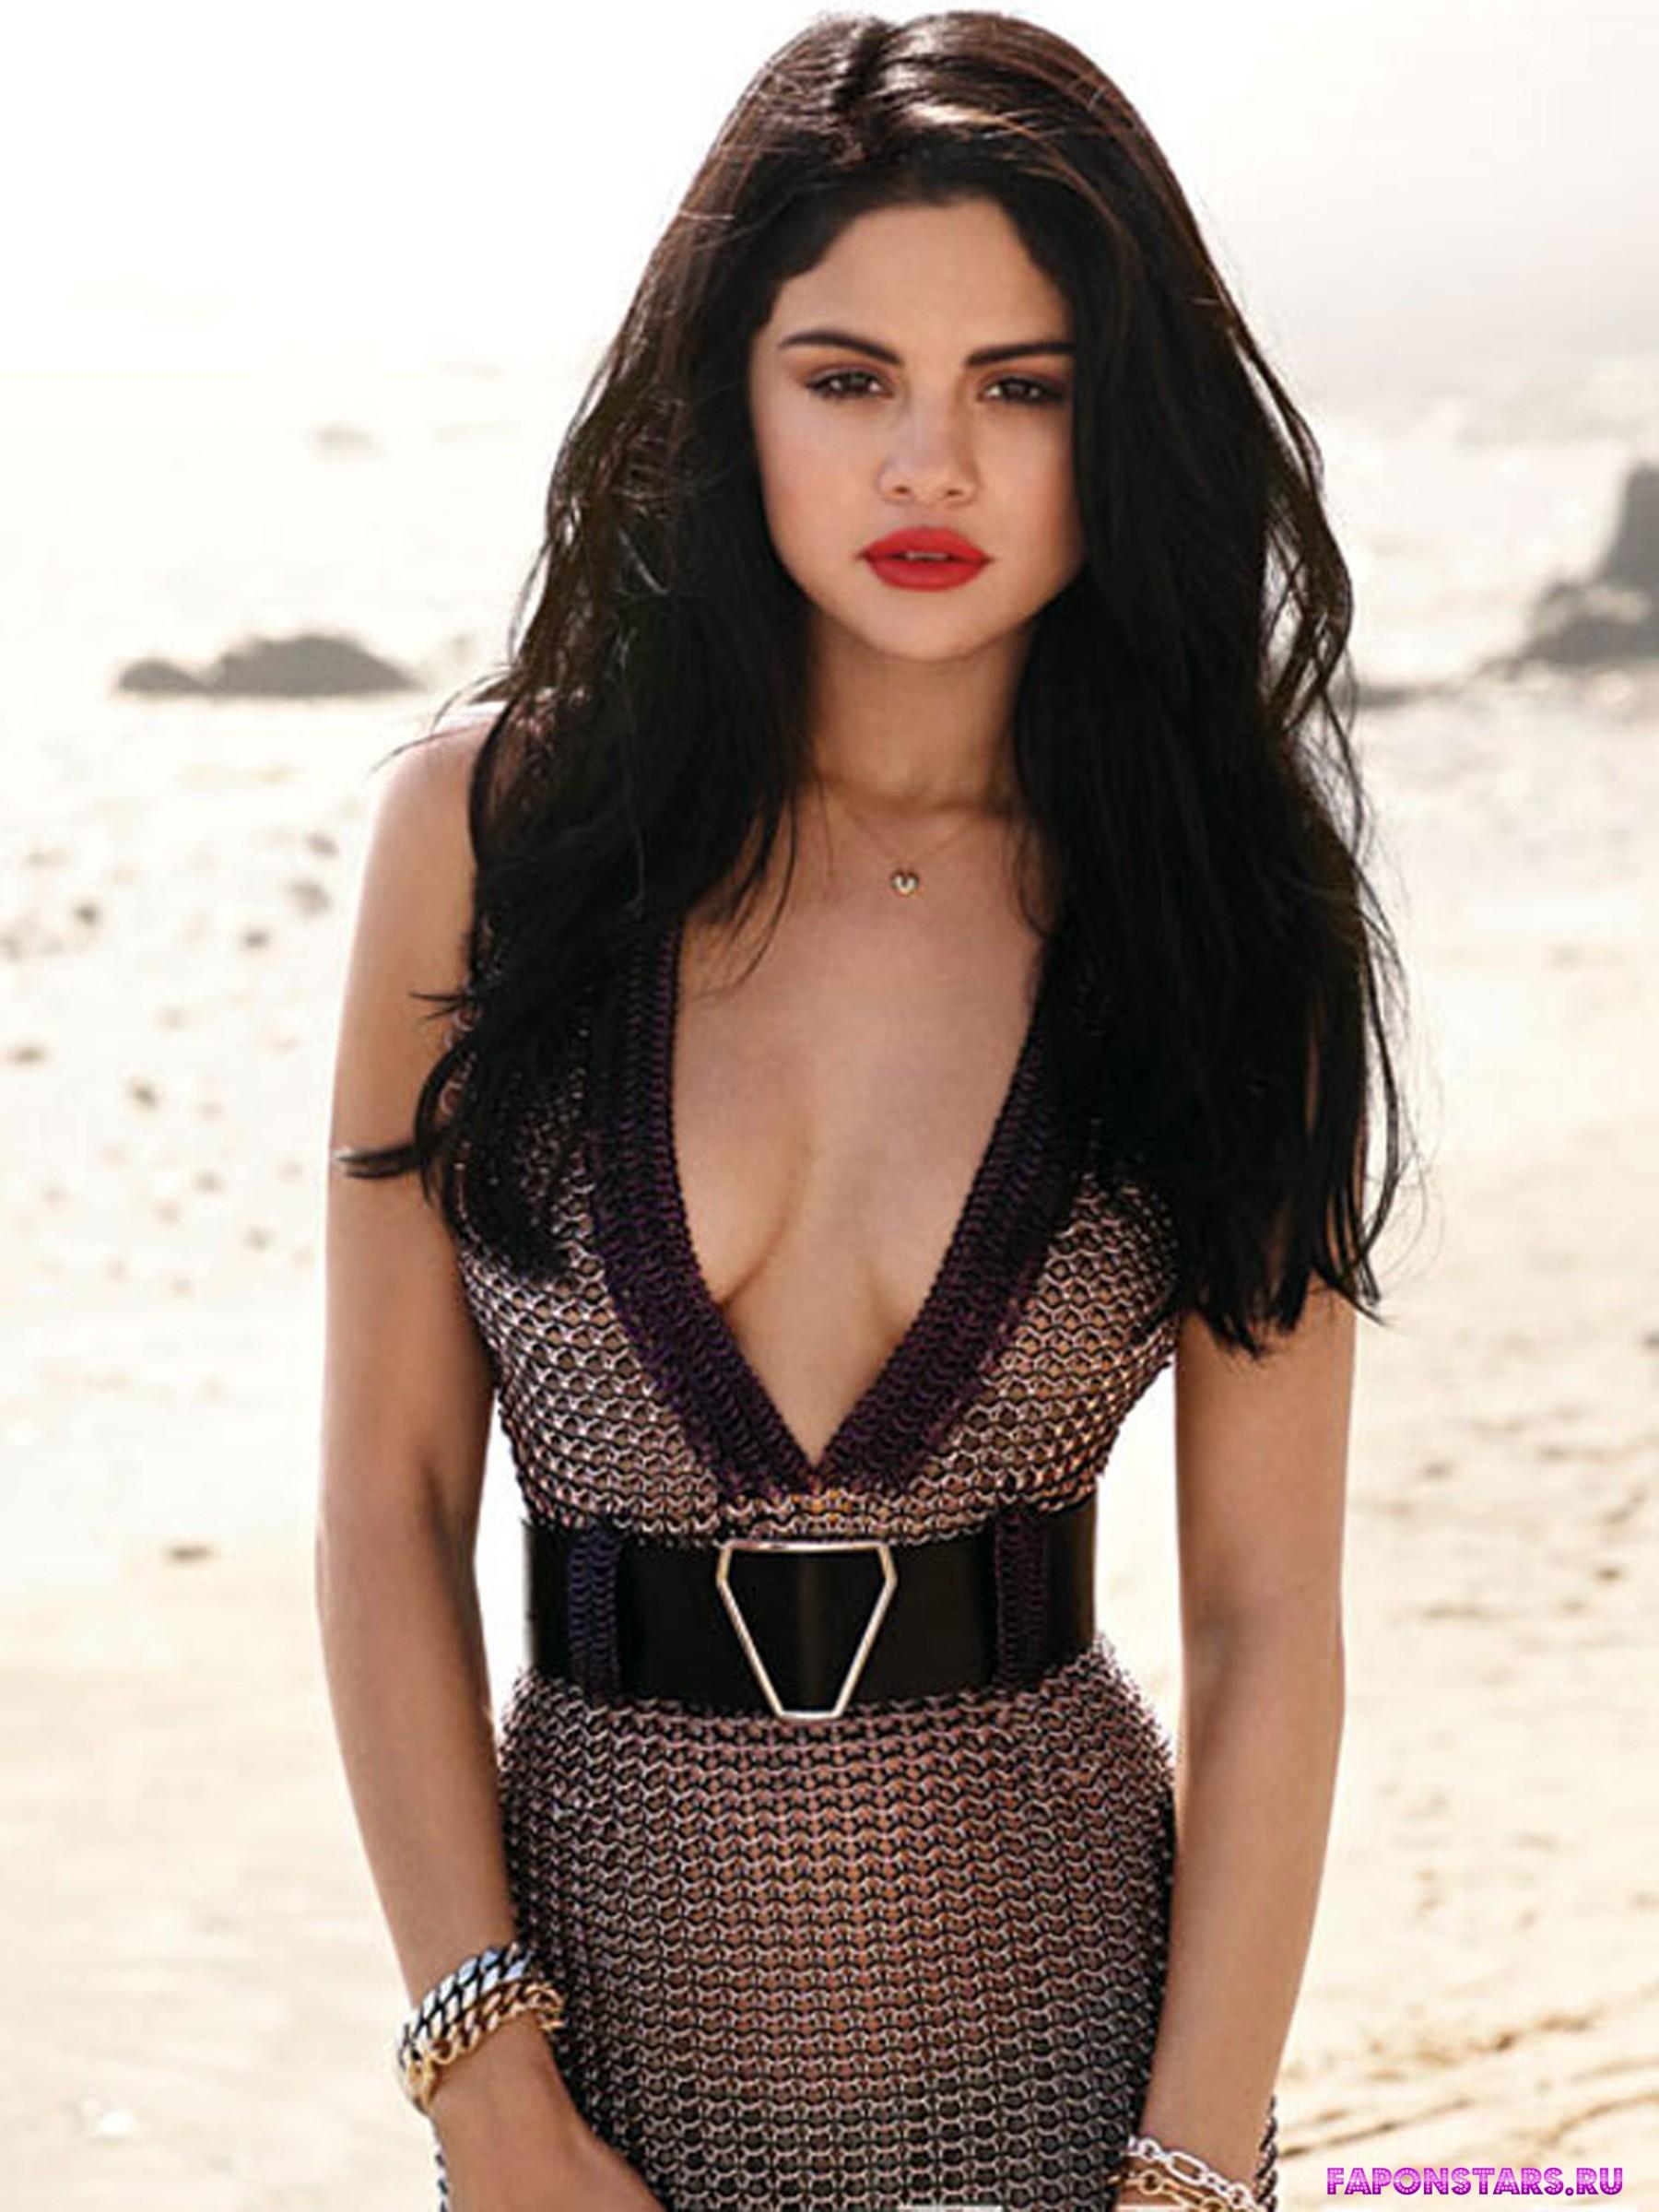 Selena Gomez / Селена Гомес в нижнем белье